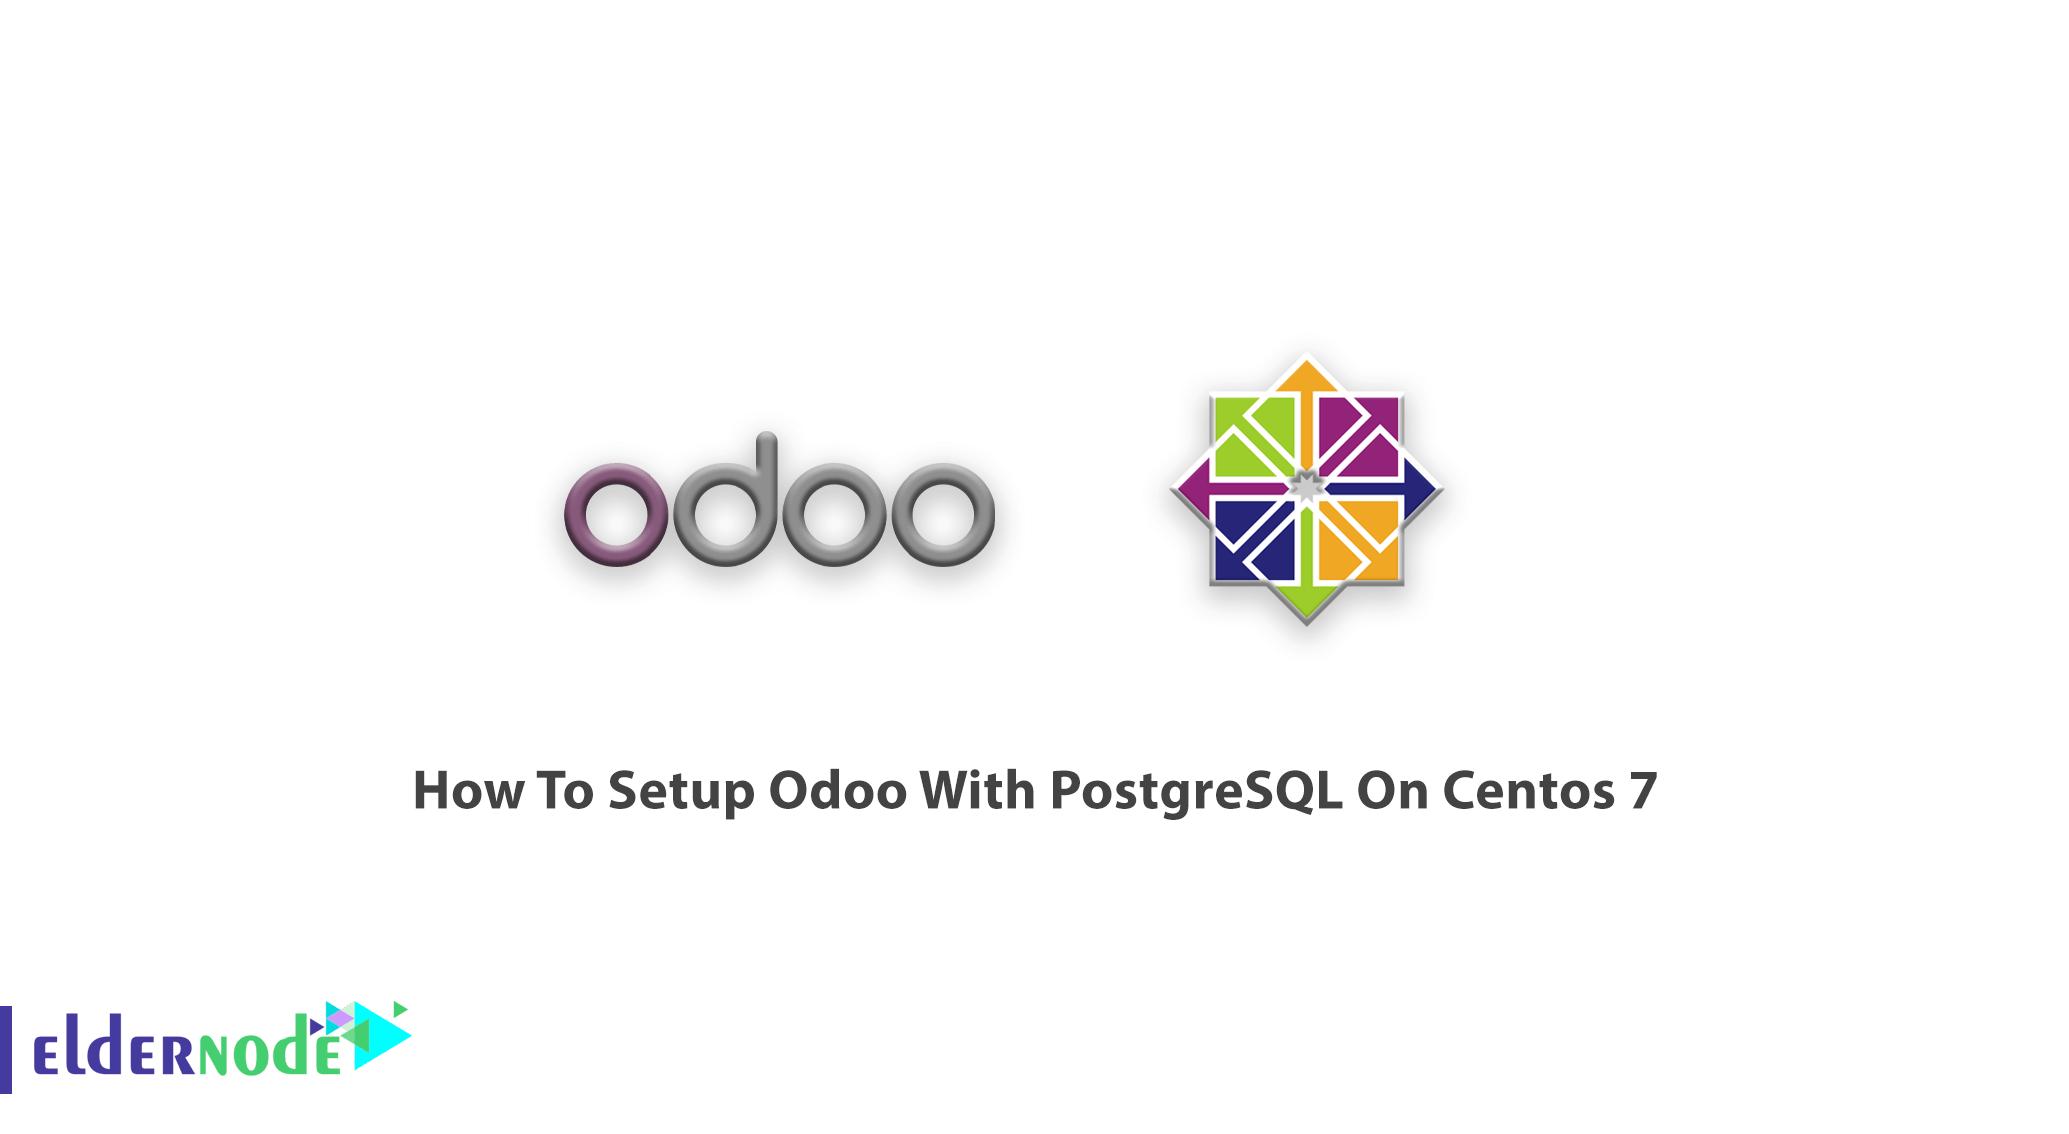 How To Setup Odoo With PostgreSQL On Centos 7